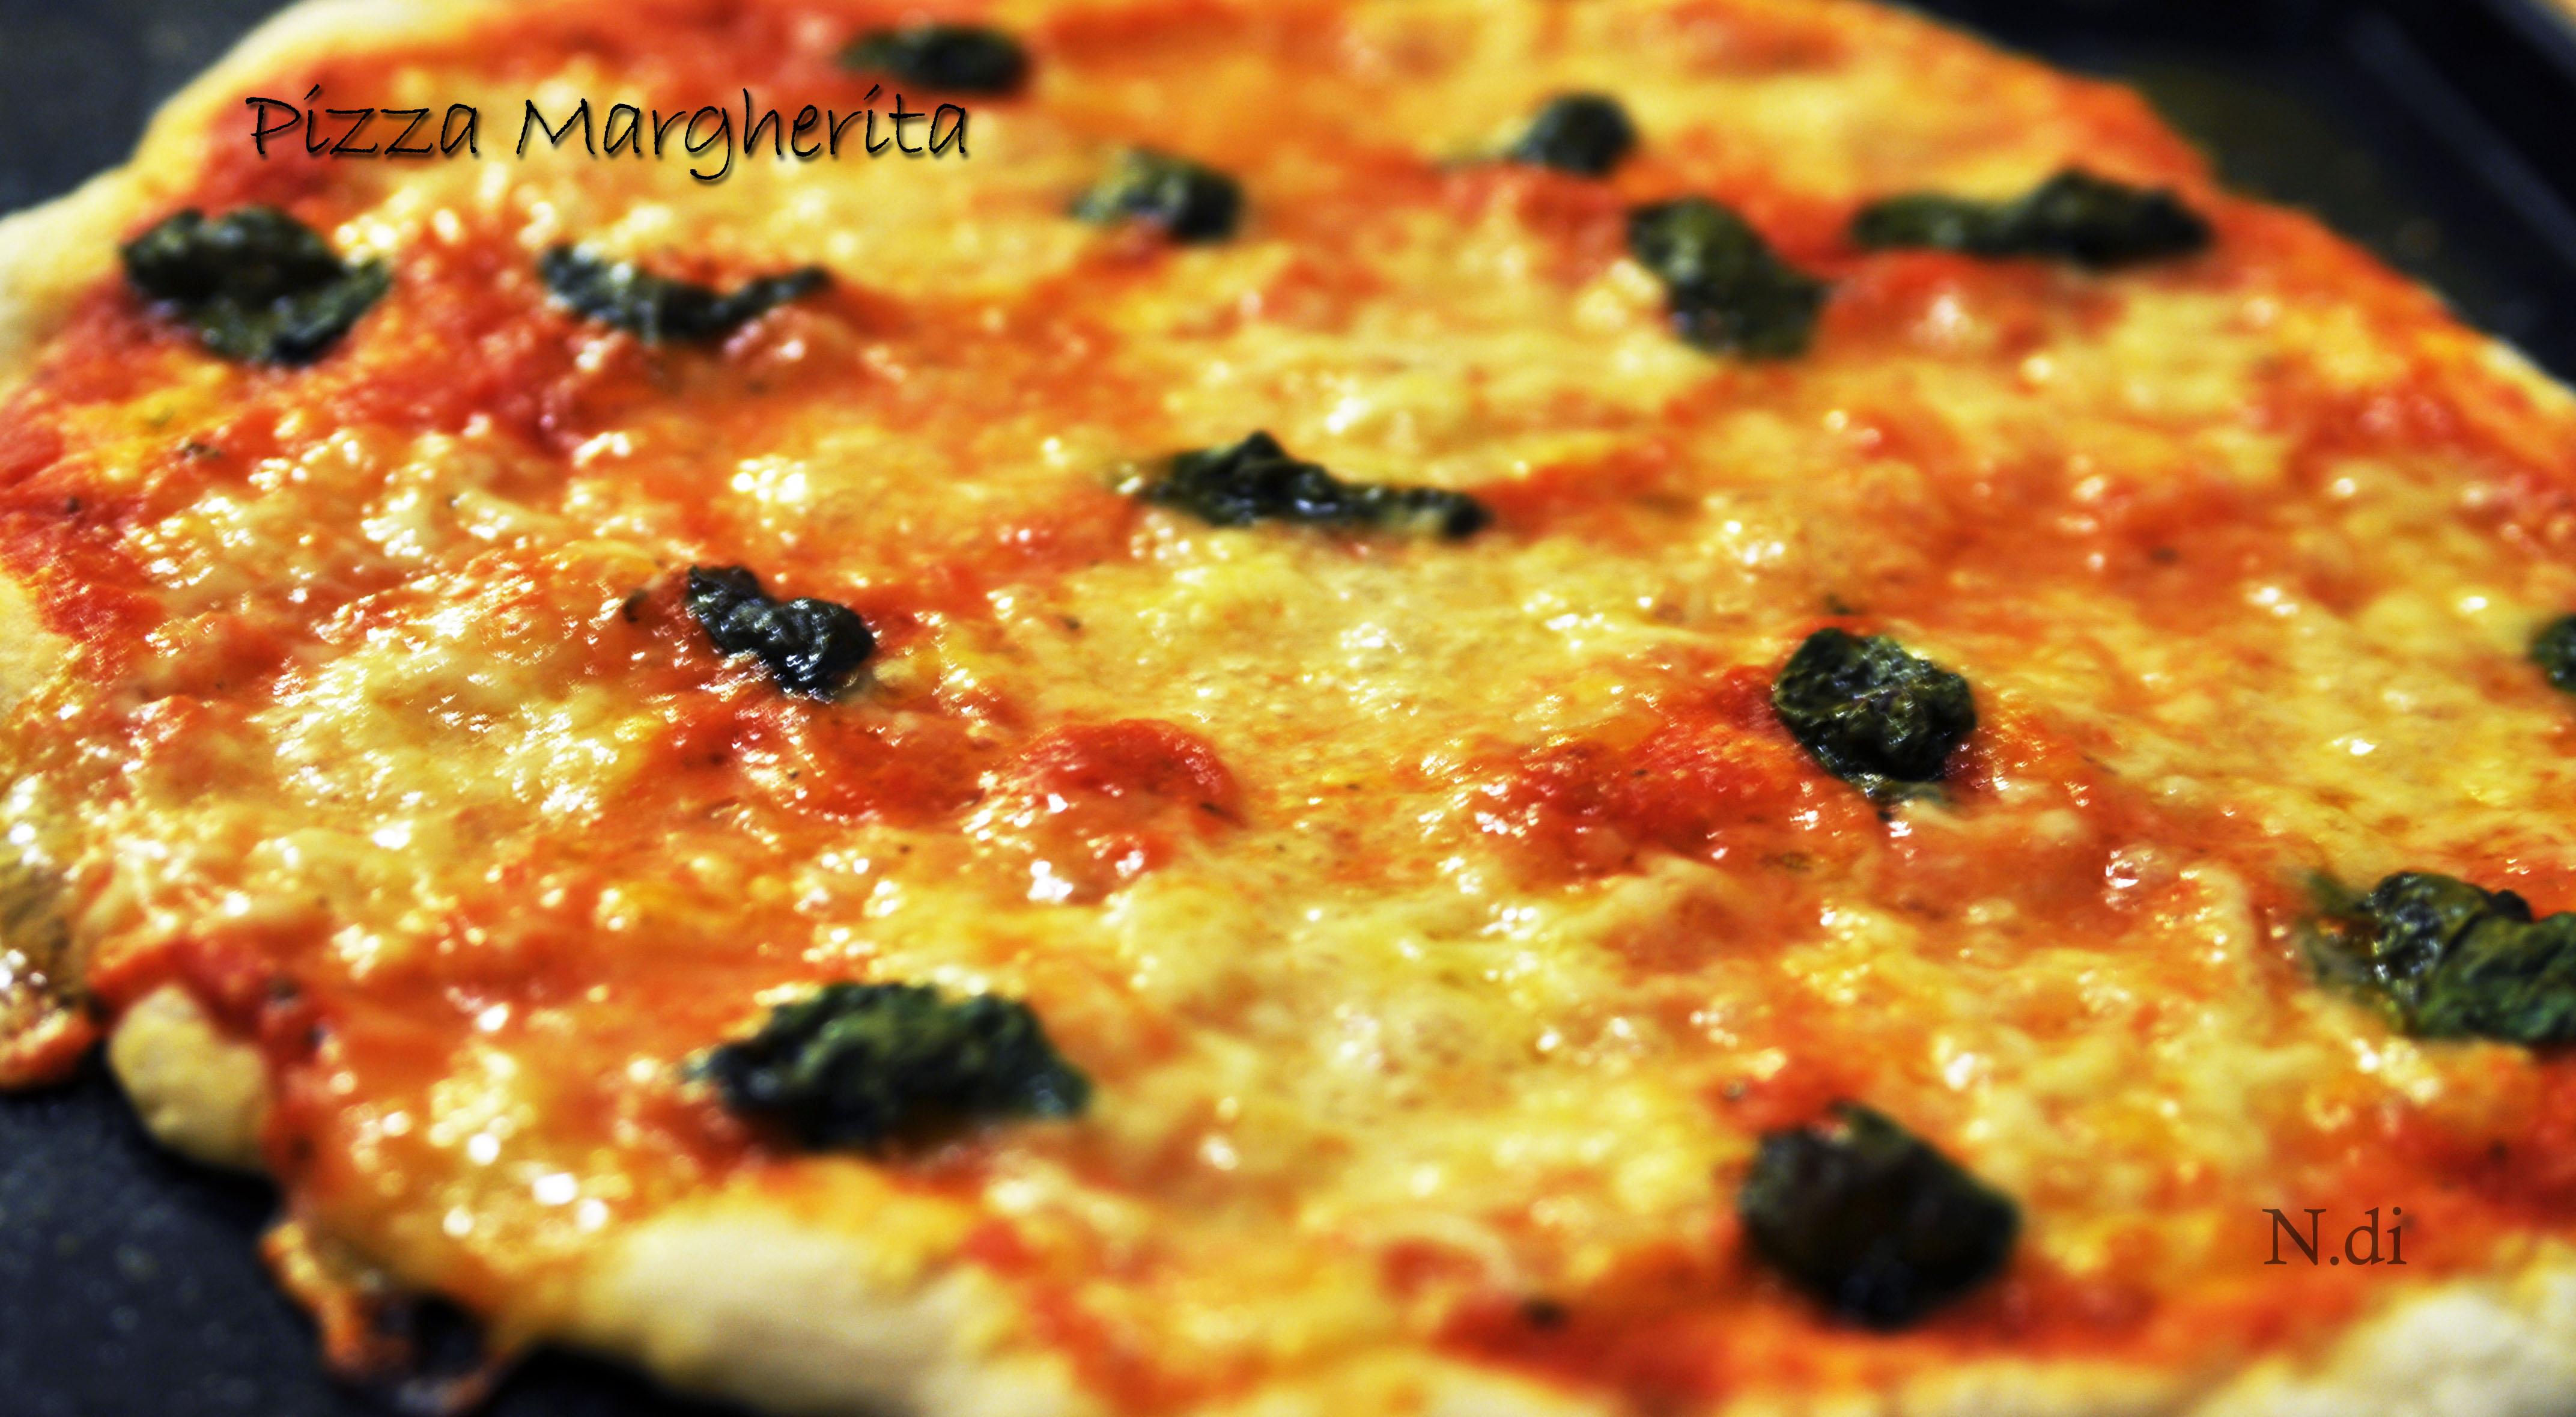 Pizza Margherita by Gennaro